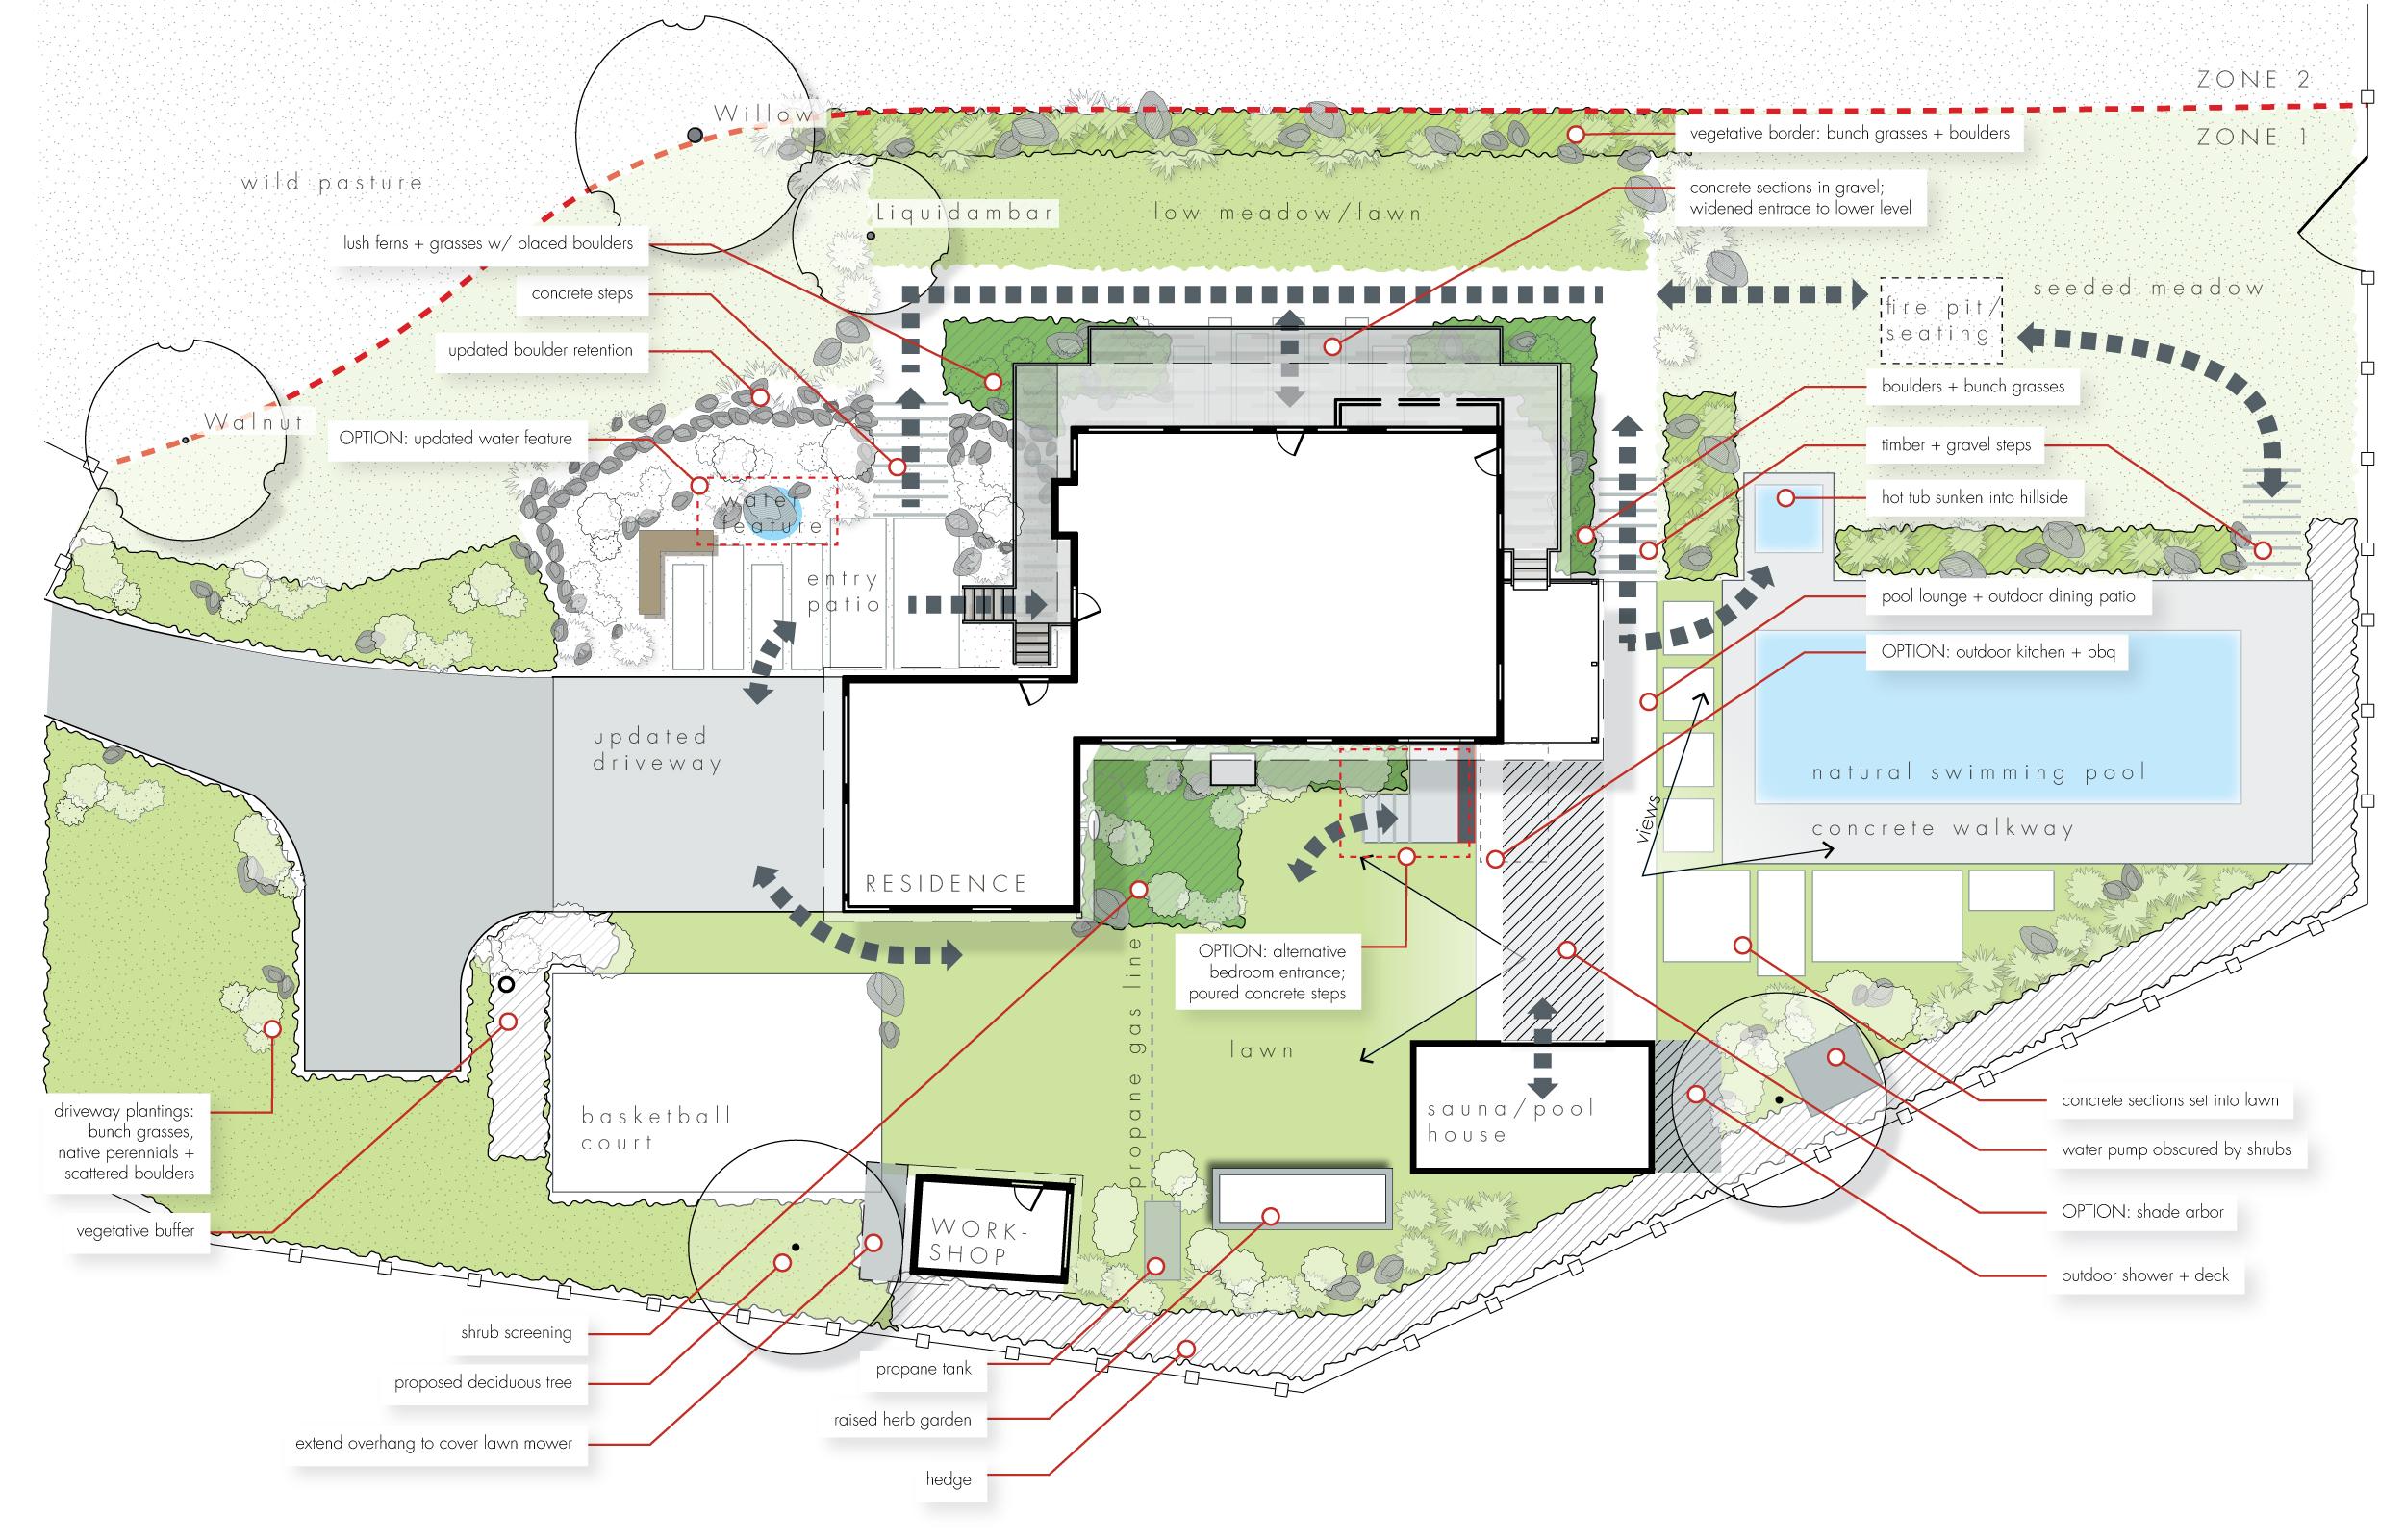 Design Services \u2014 Regenesis Landscape Design + Construction in